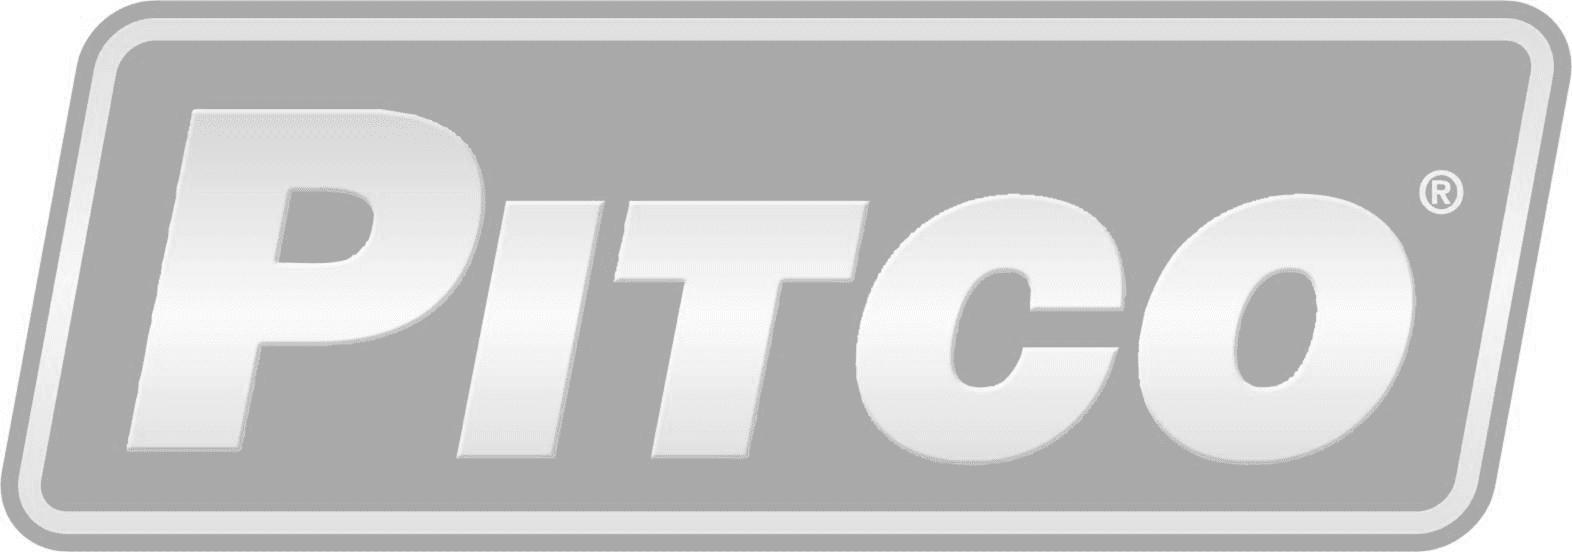 Pitco-Hochleistungsfritteusen